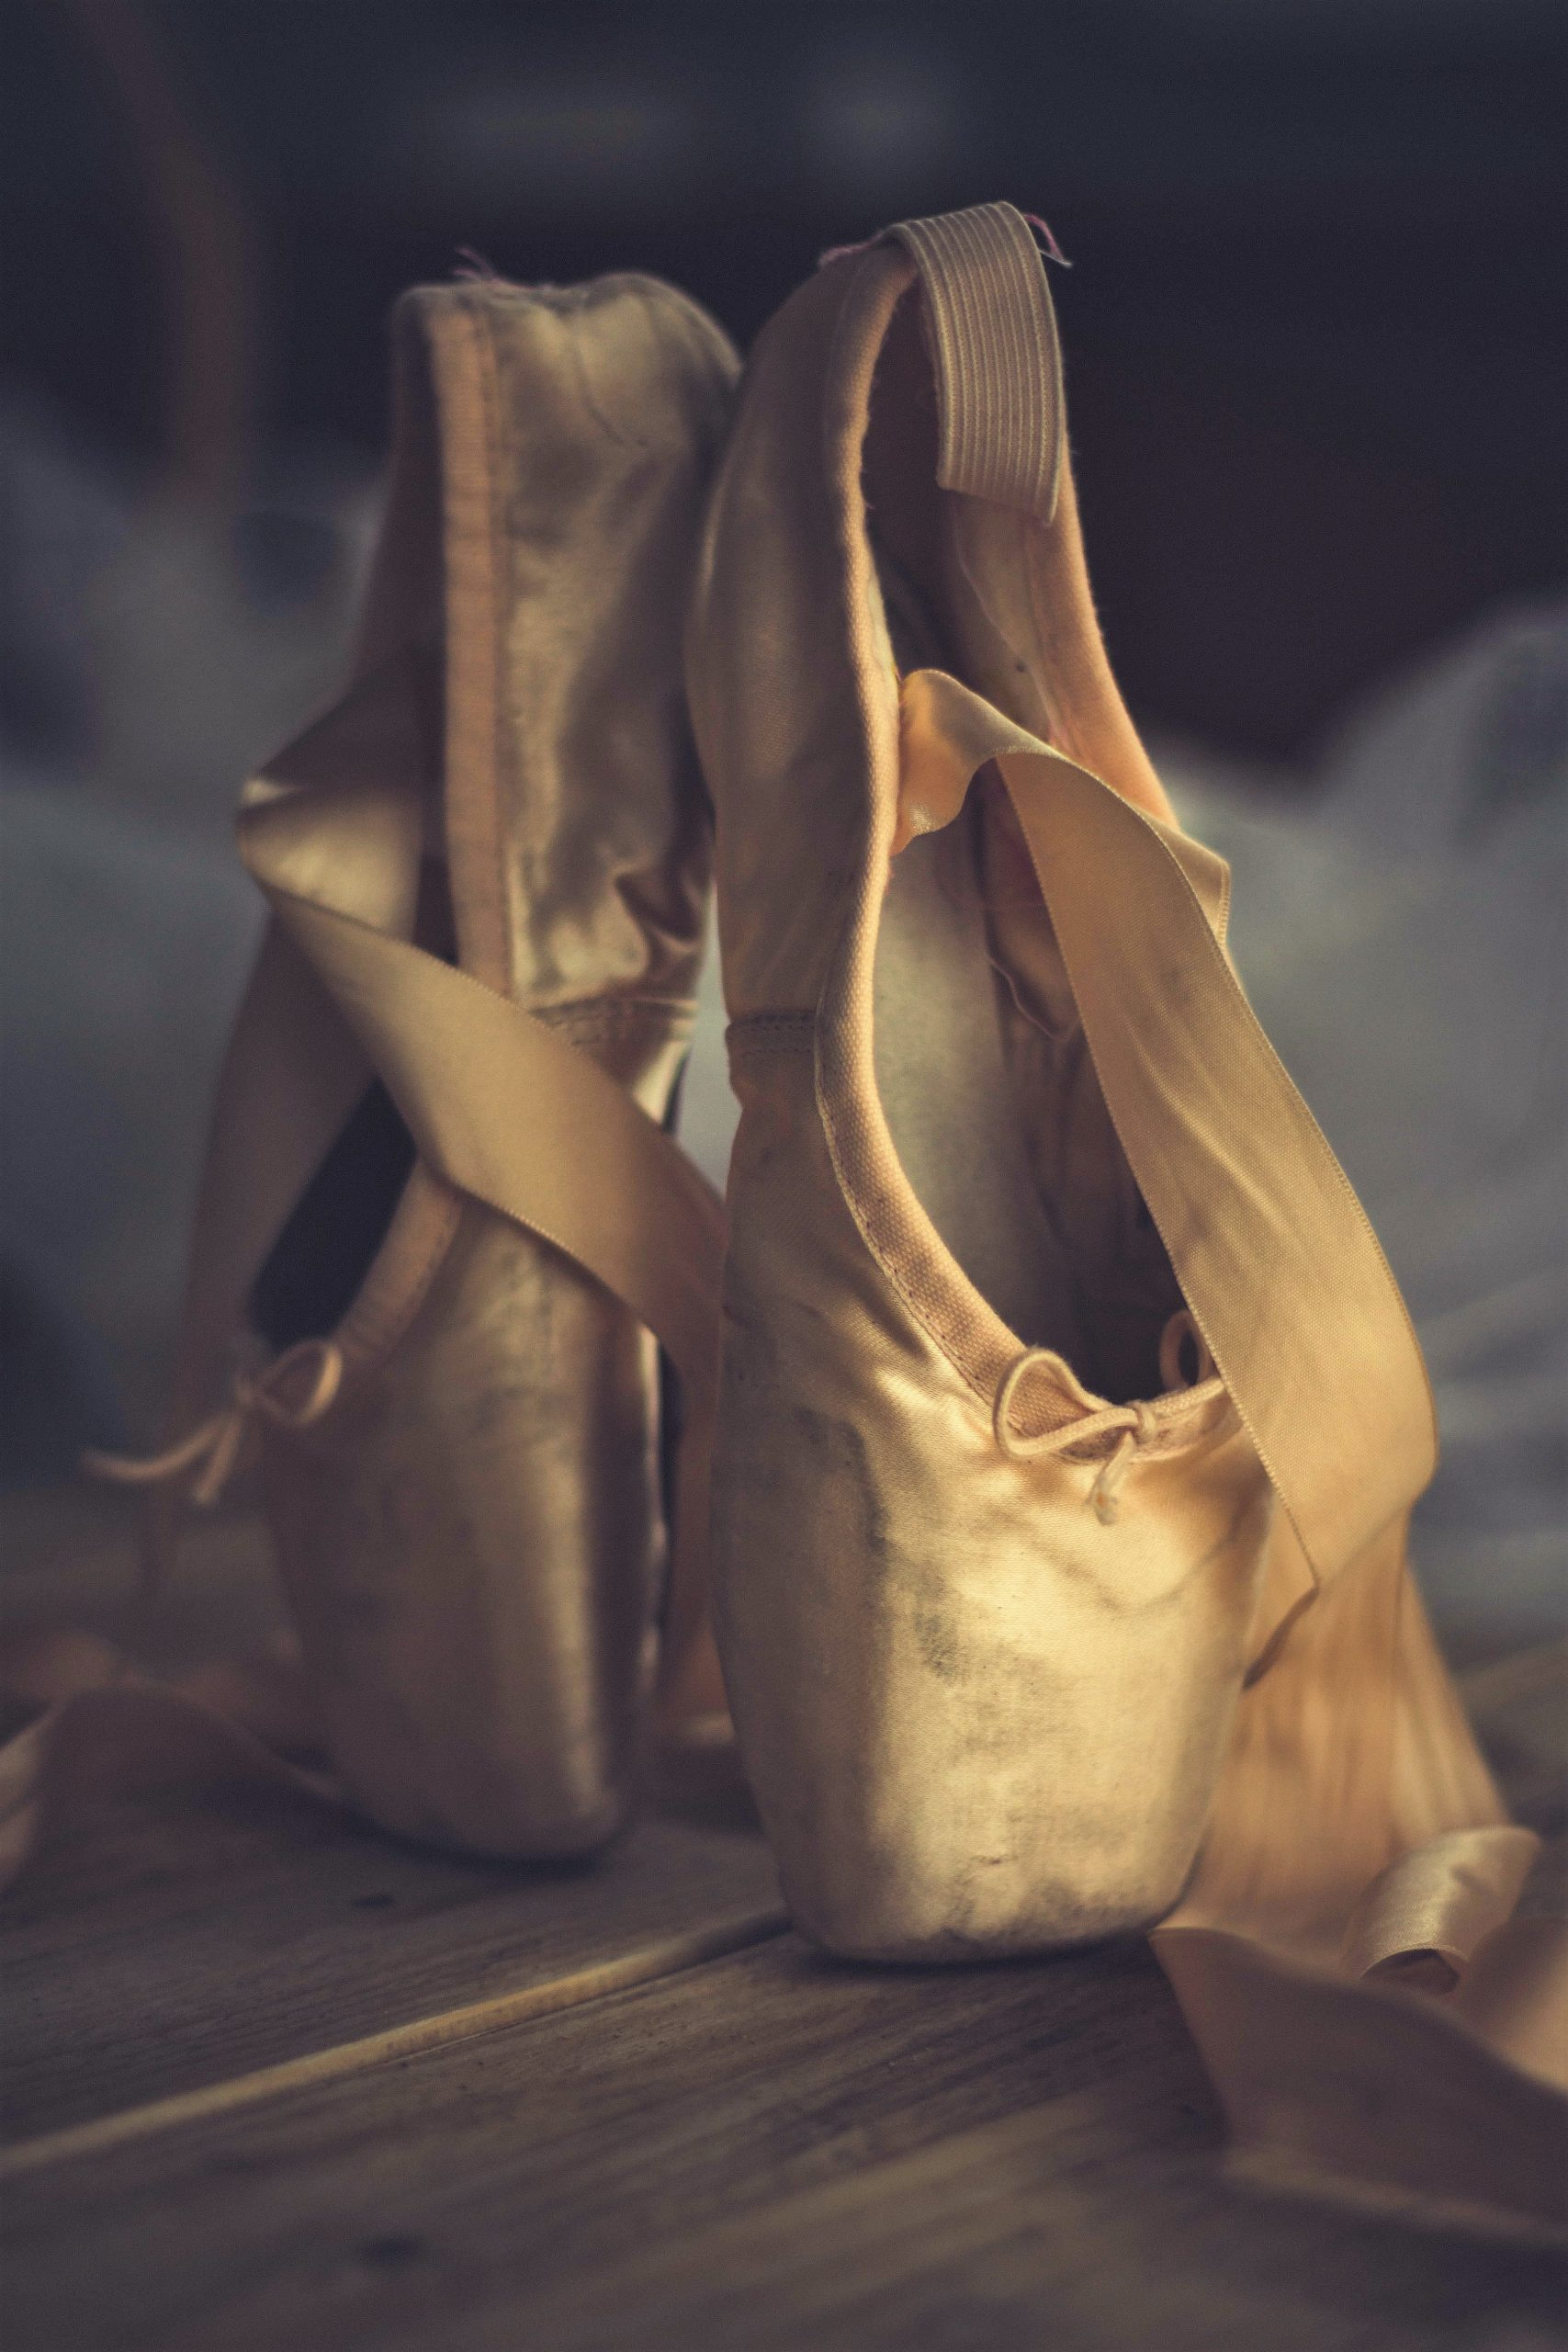 https://www.ccsaar.de/wp-content/uploads/2021/04/ballet-1919321-scaled.jpg